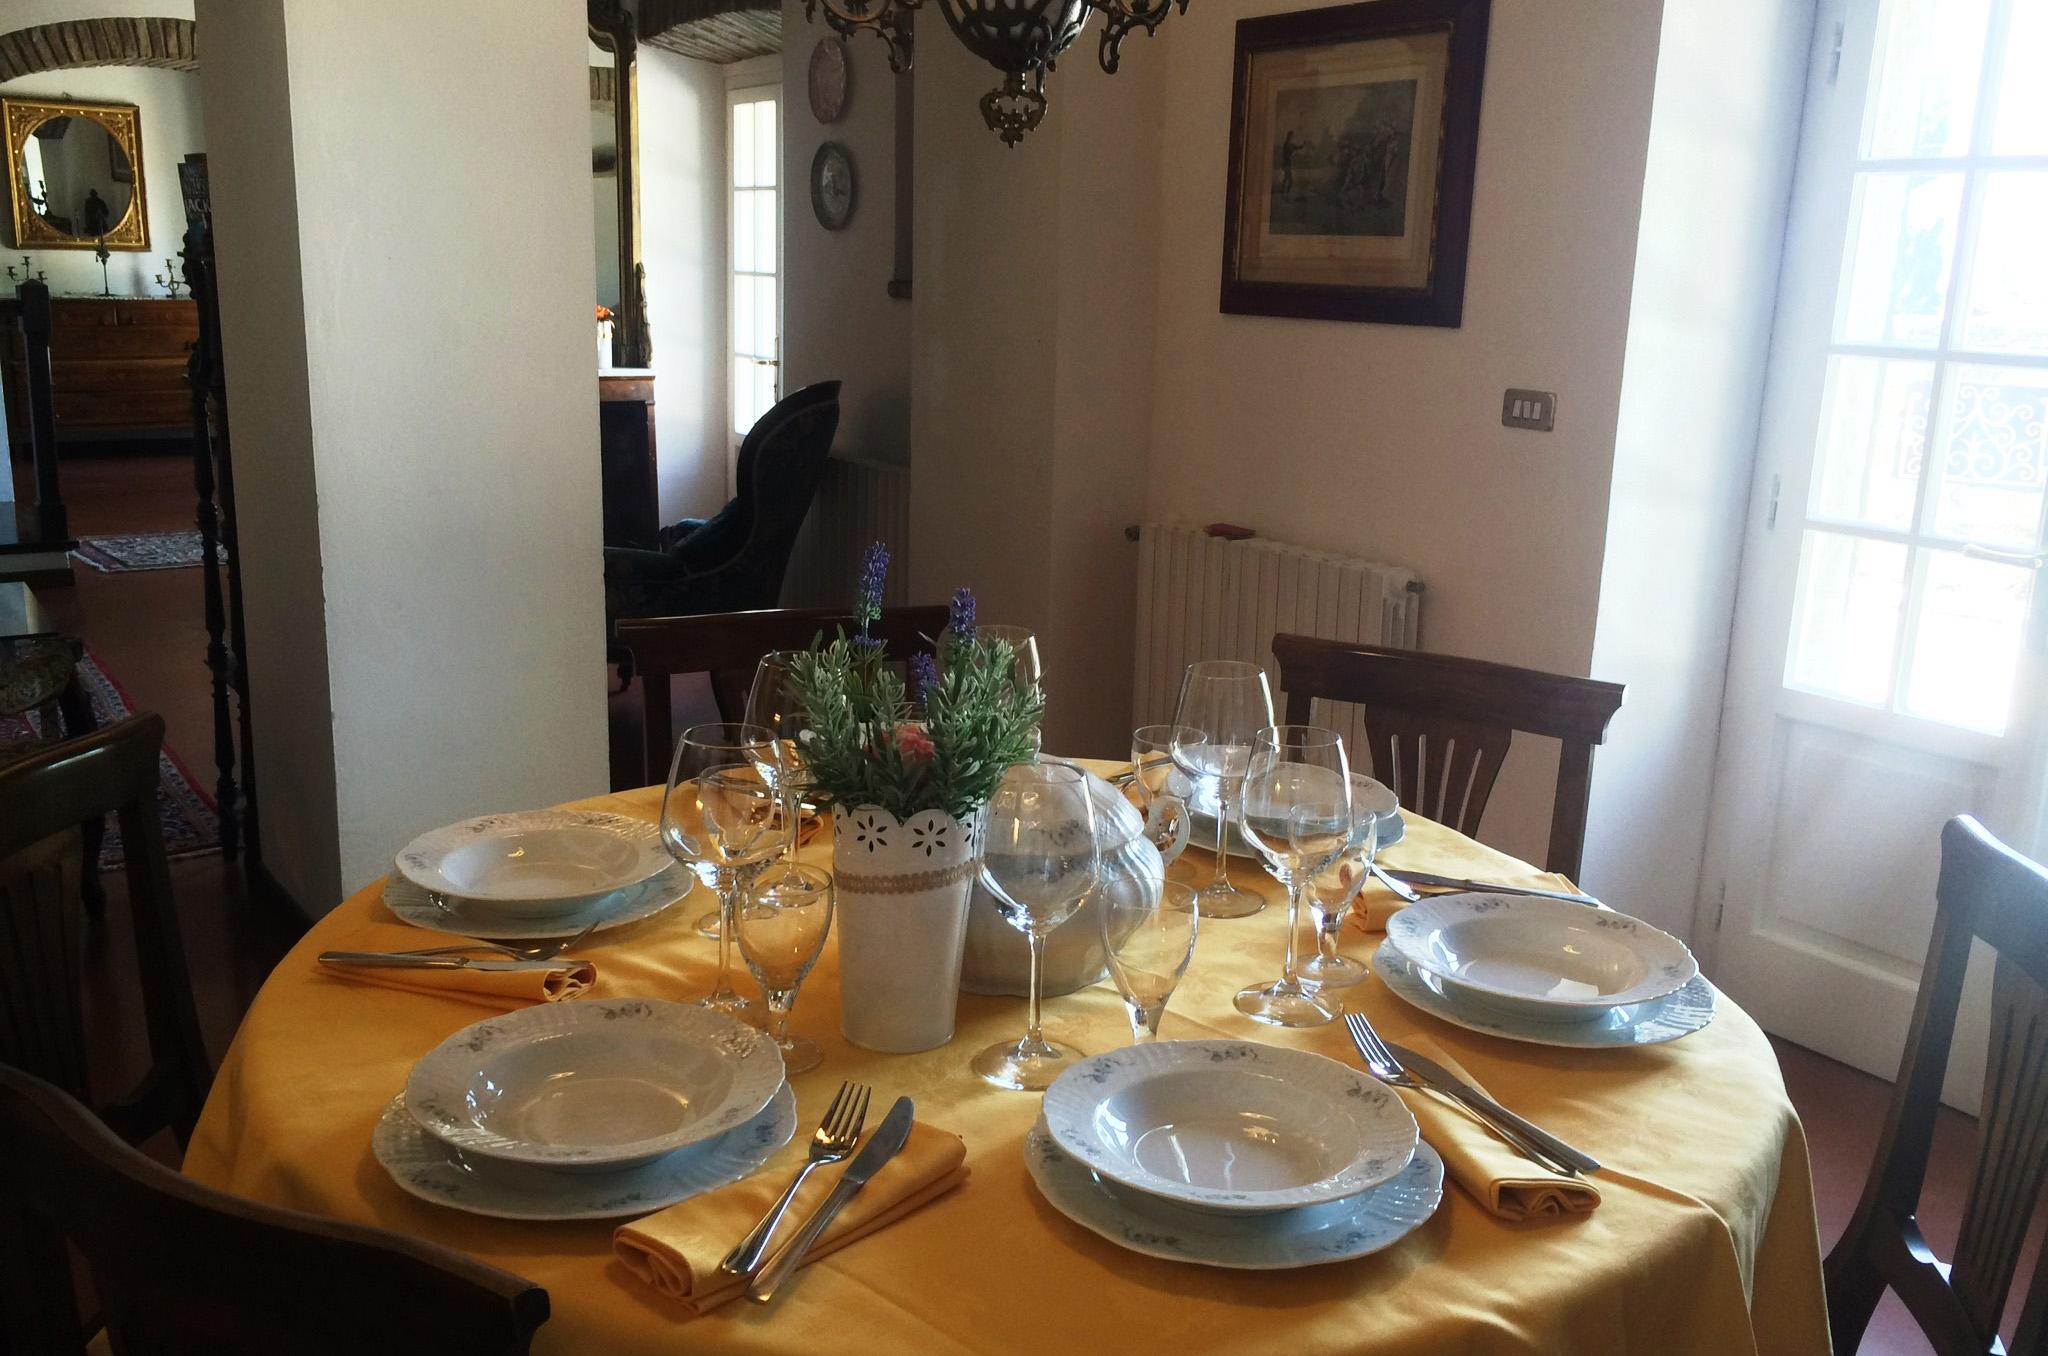 Ferienhaus Villa 6 pax (367992), Cortona, Arezzo, Toskana, Italien, Bild 2